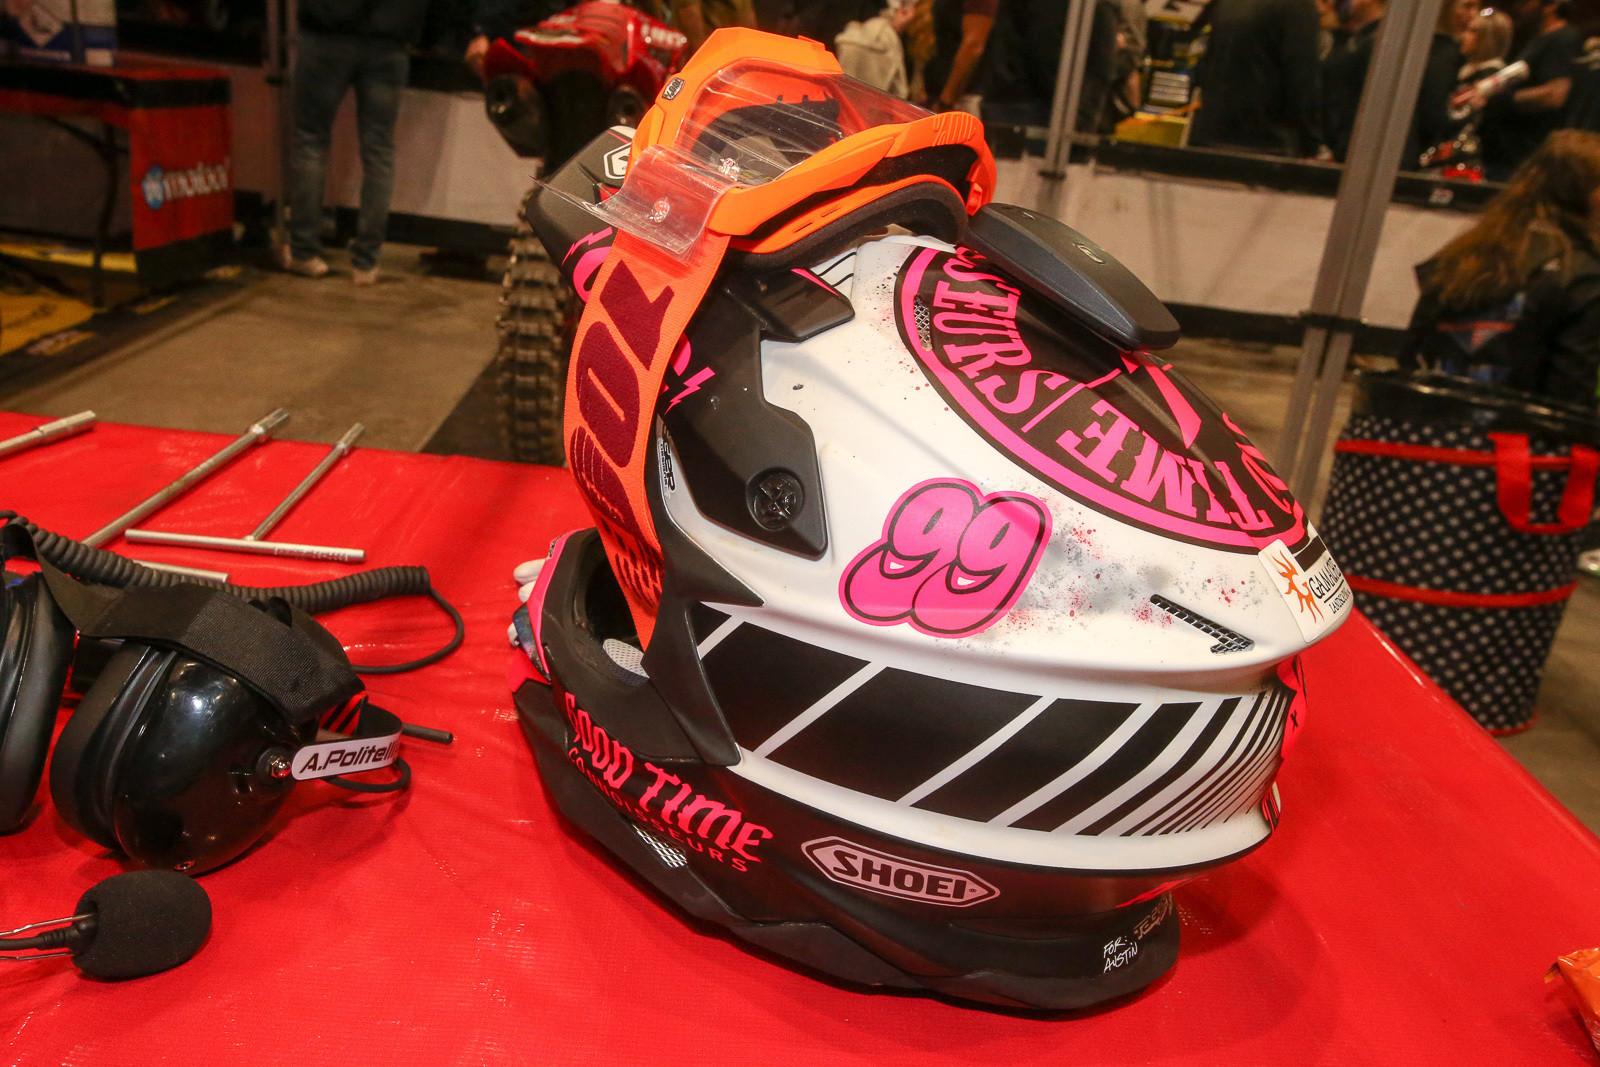 We like the Good Time Conniseur label on Austin Politelli's helmet.